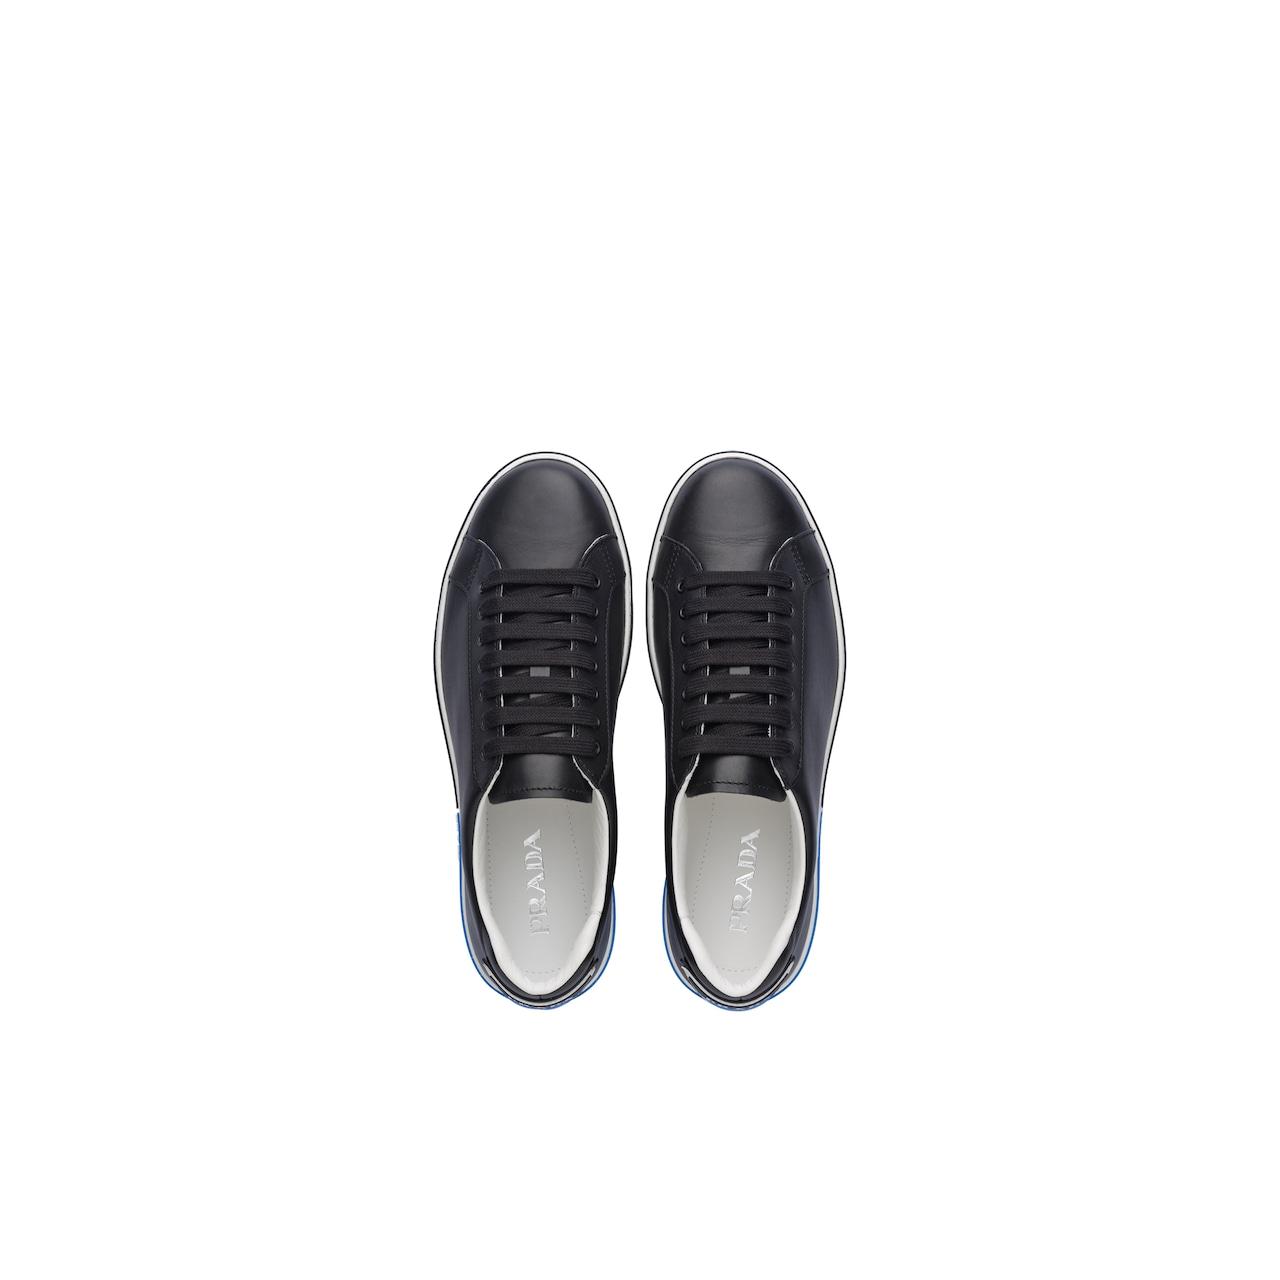 Prada Leather sneakers 3